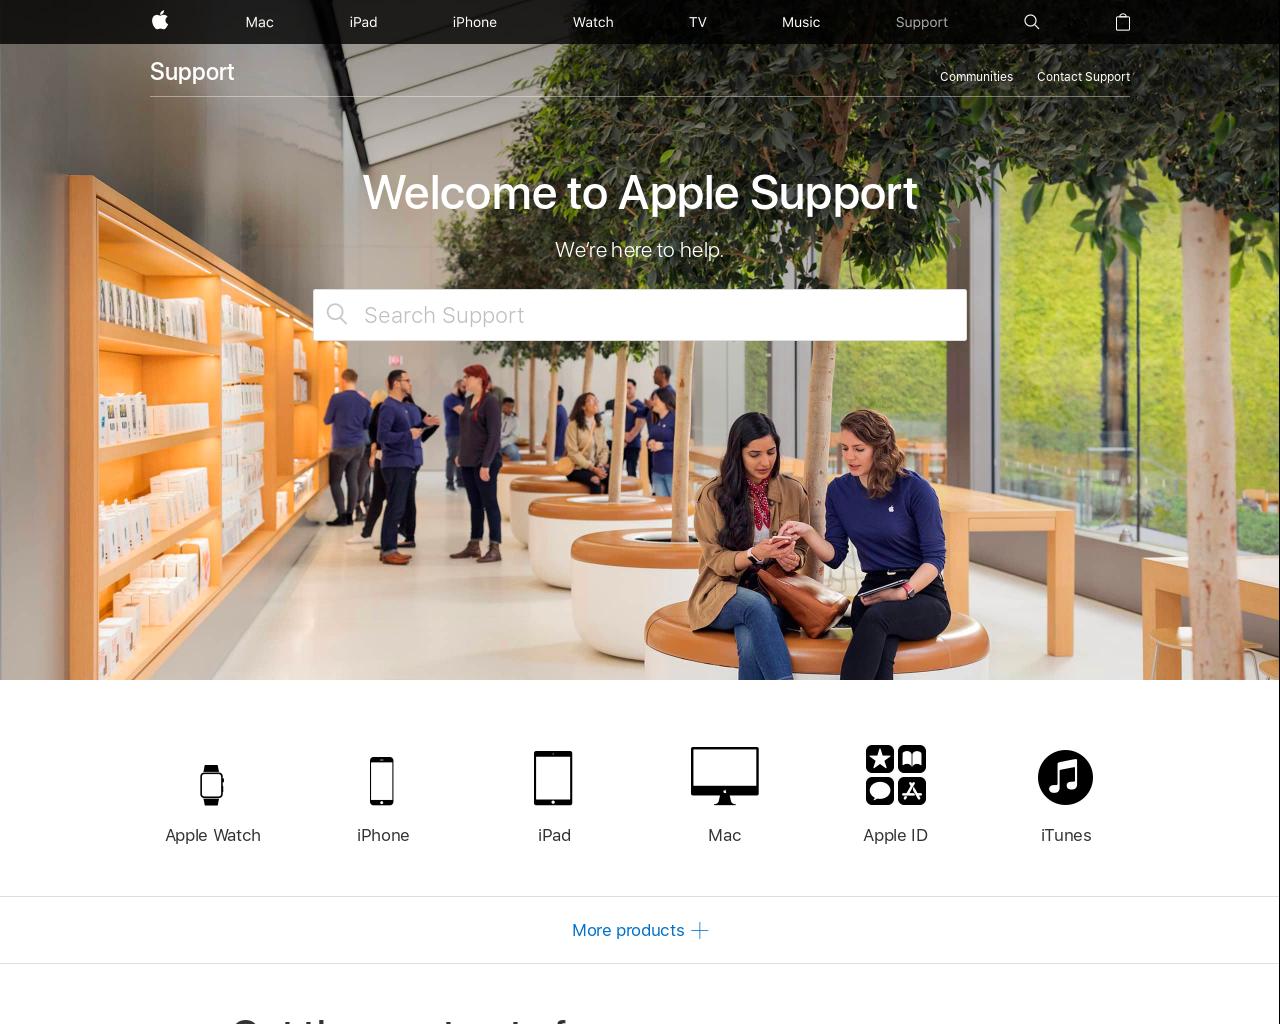 support.apple.com(2017/12/30 15:50:38)